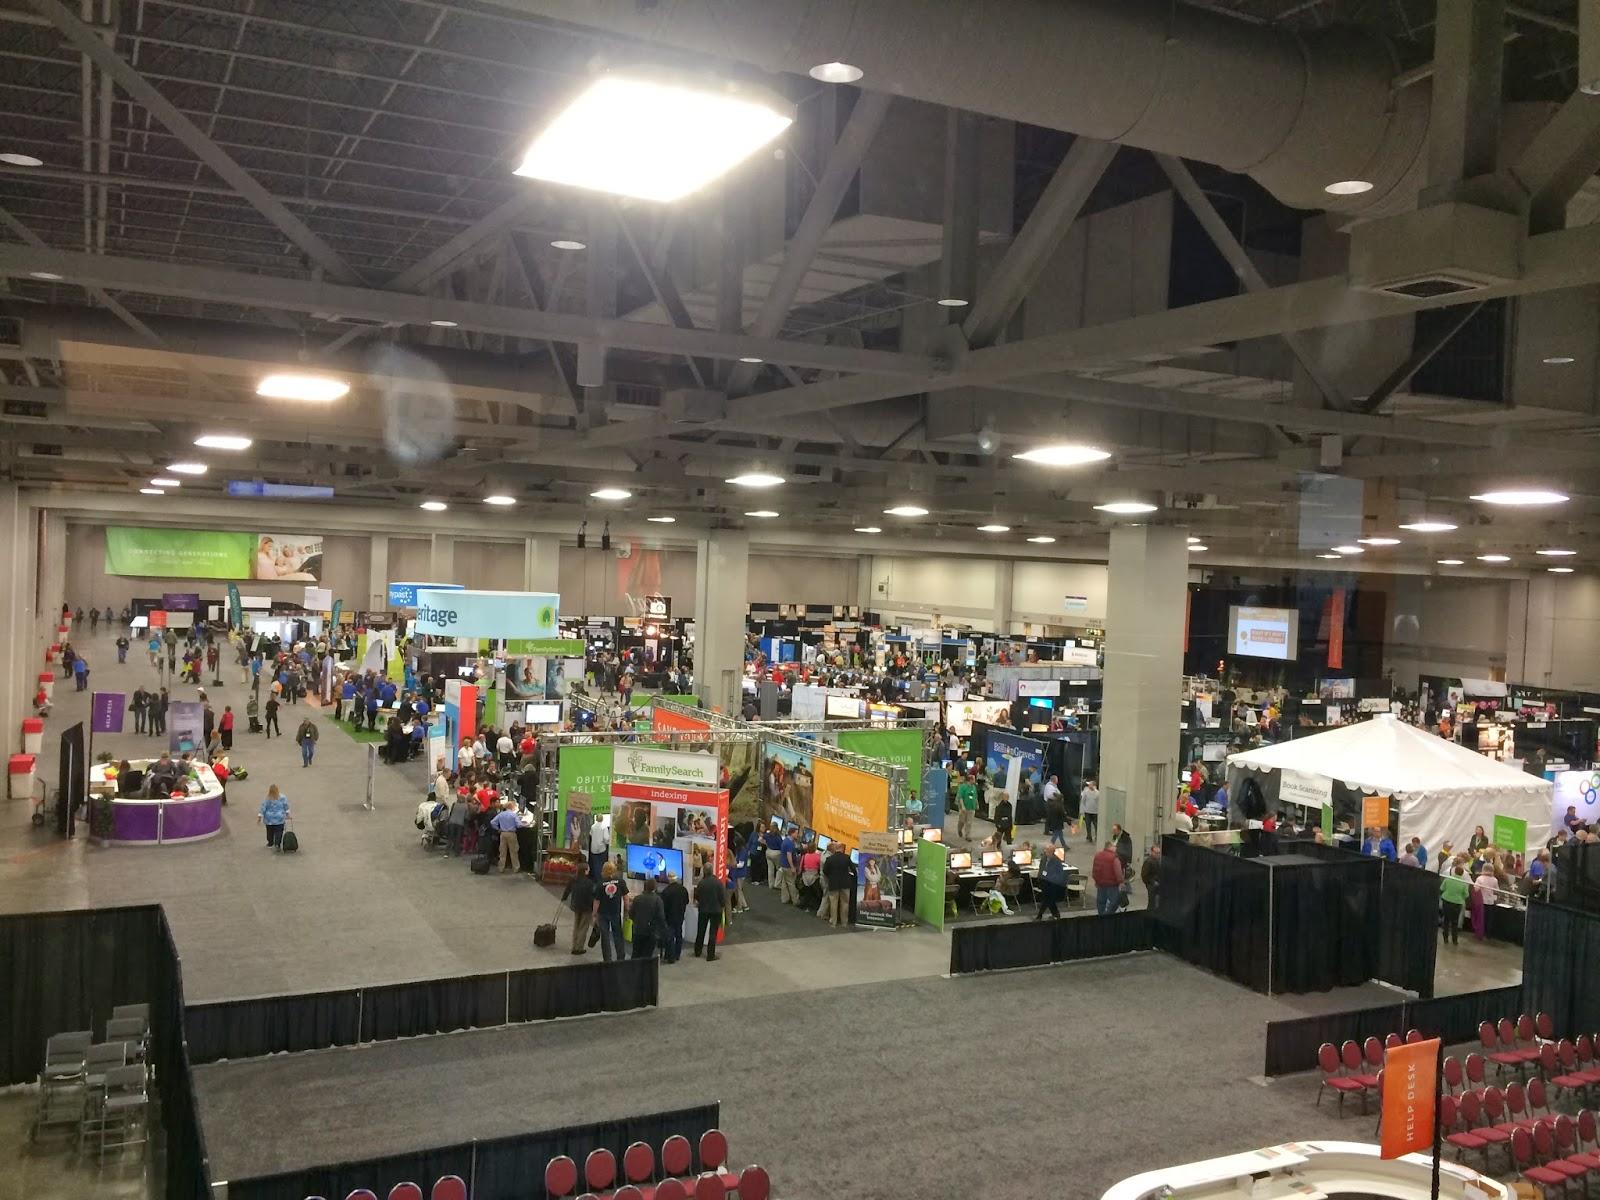 Eagle's Eye View of Expo Hall